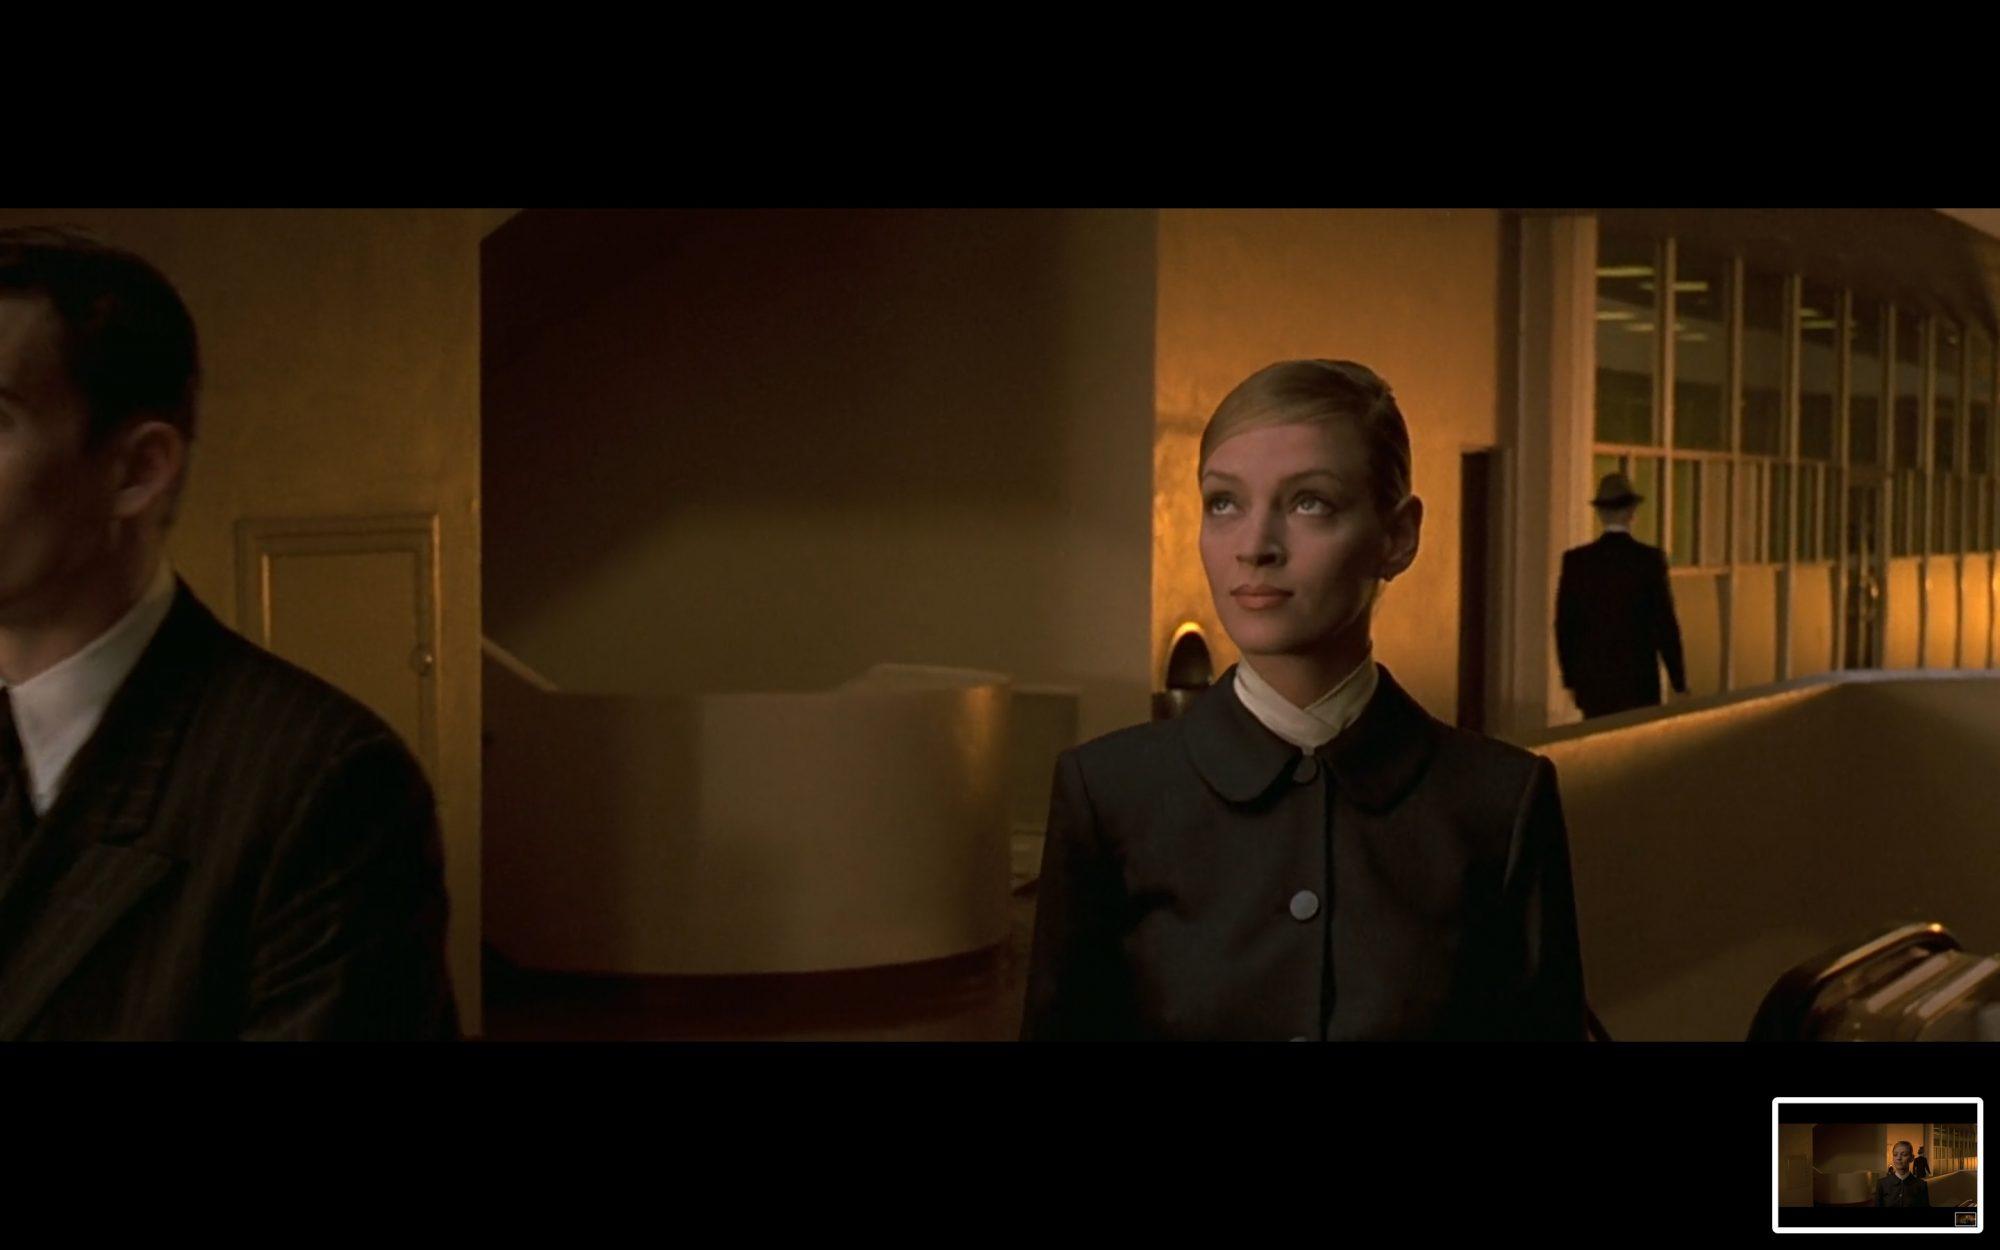 db6de1ebbacb GATTACA: one of the great films.